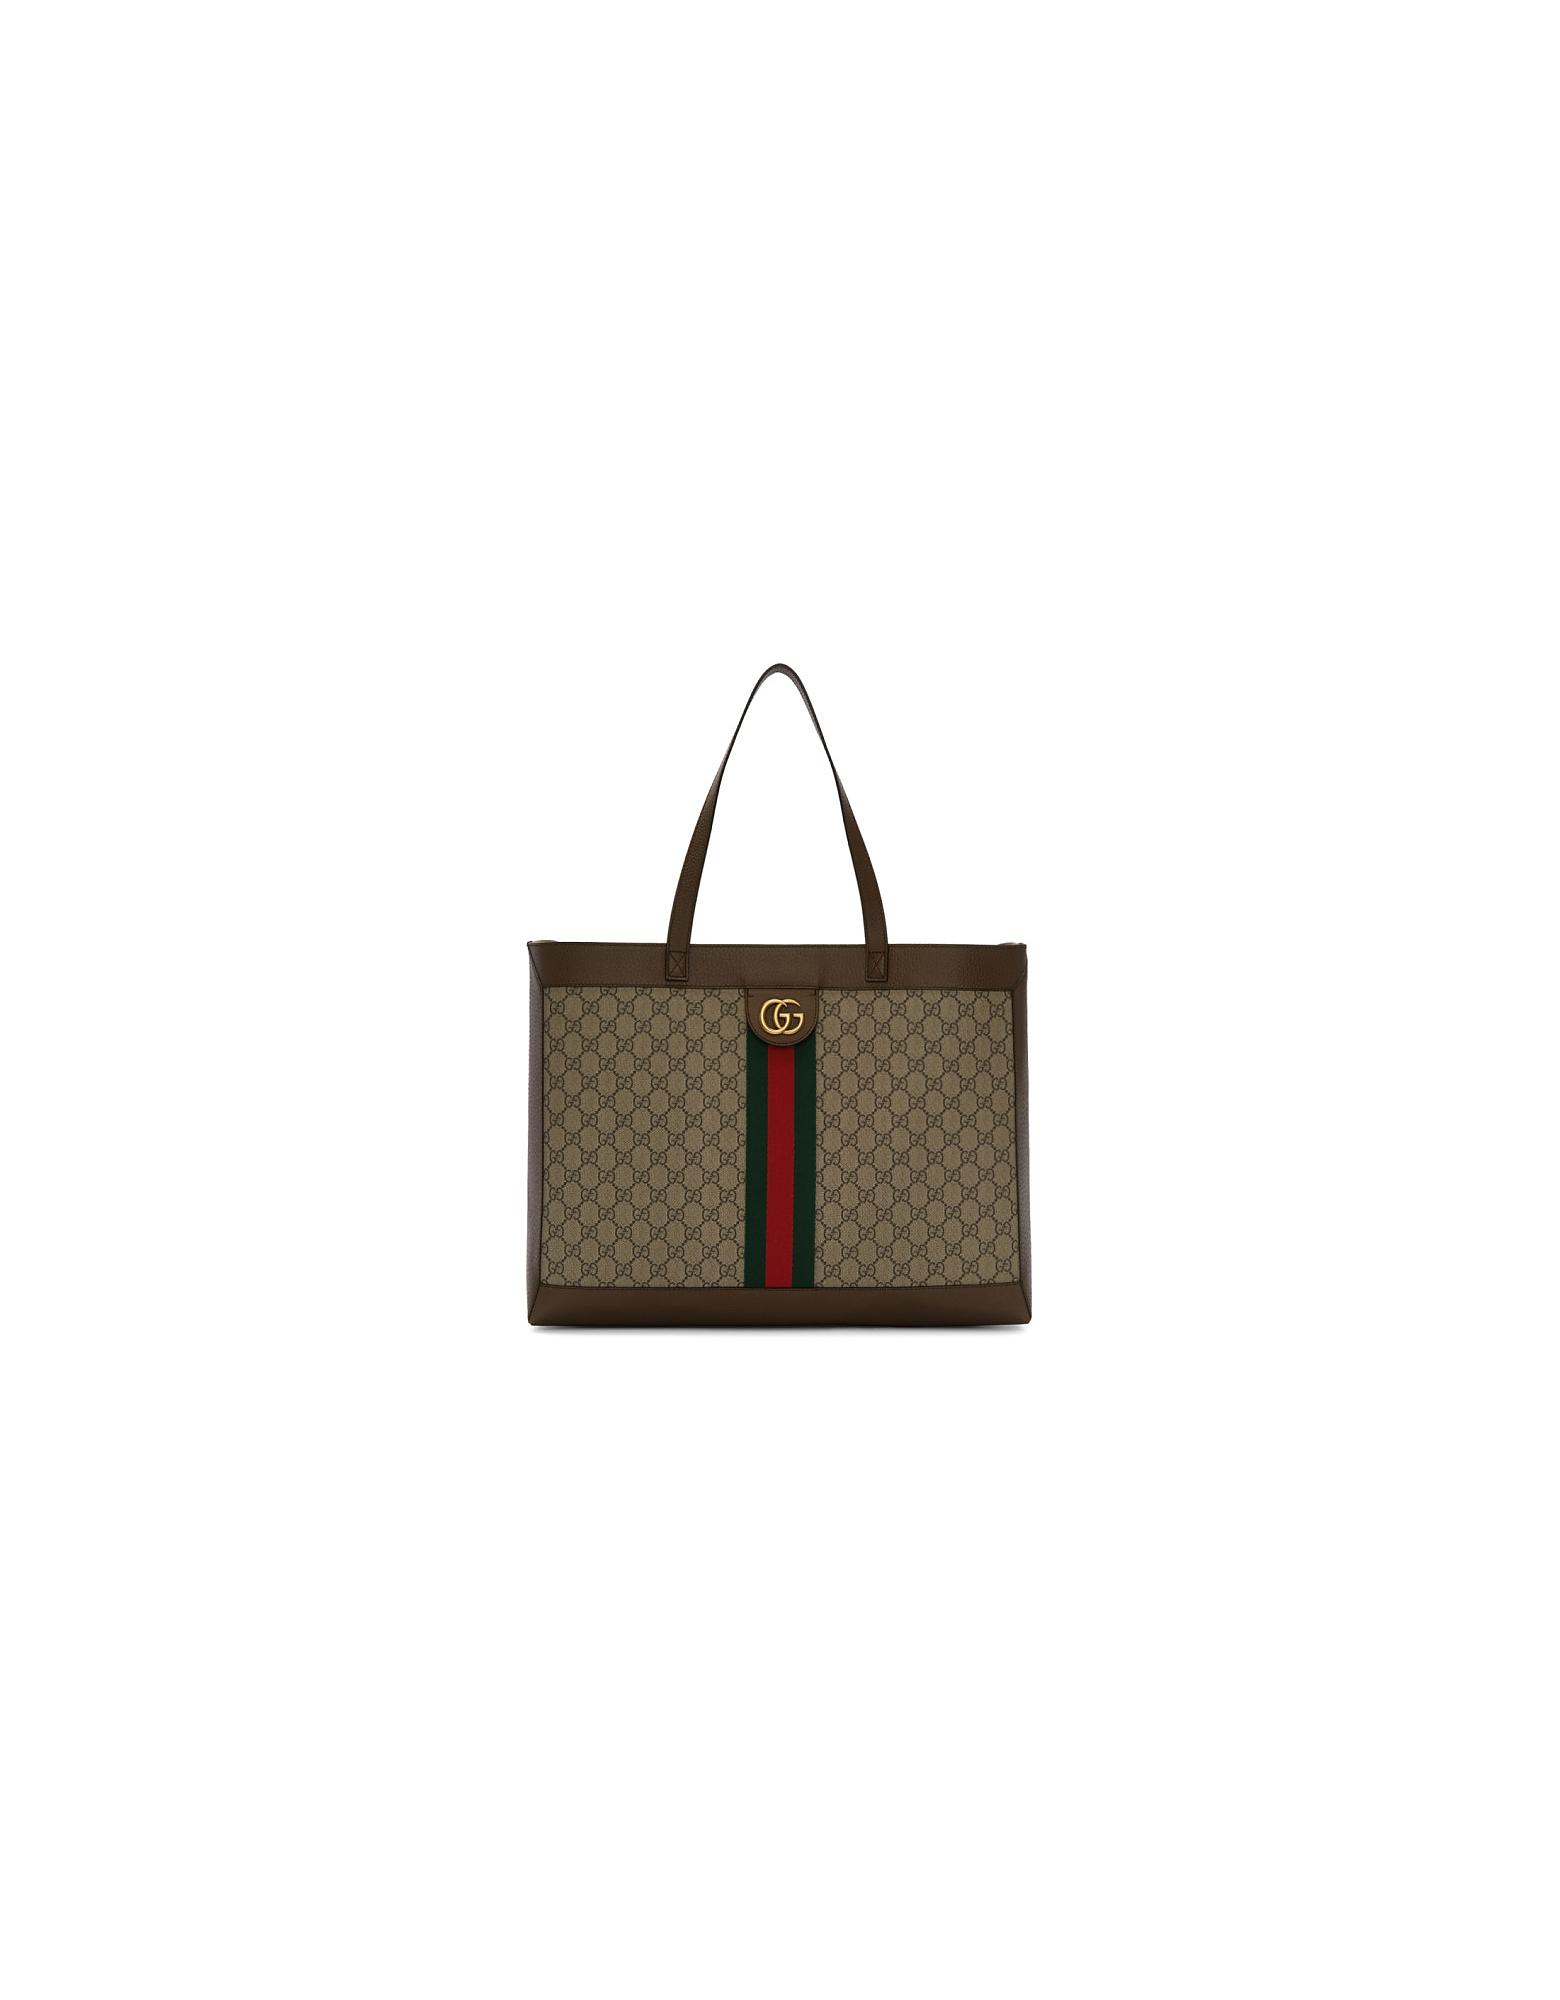 Gucci Designer Handbags, Beige GG Ophidia Tote